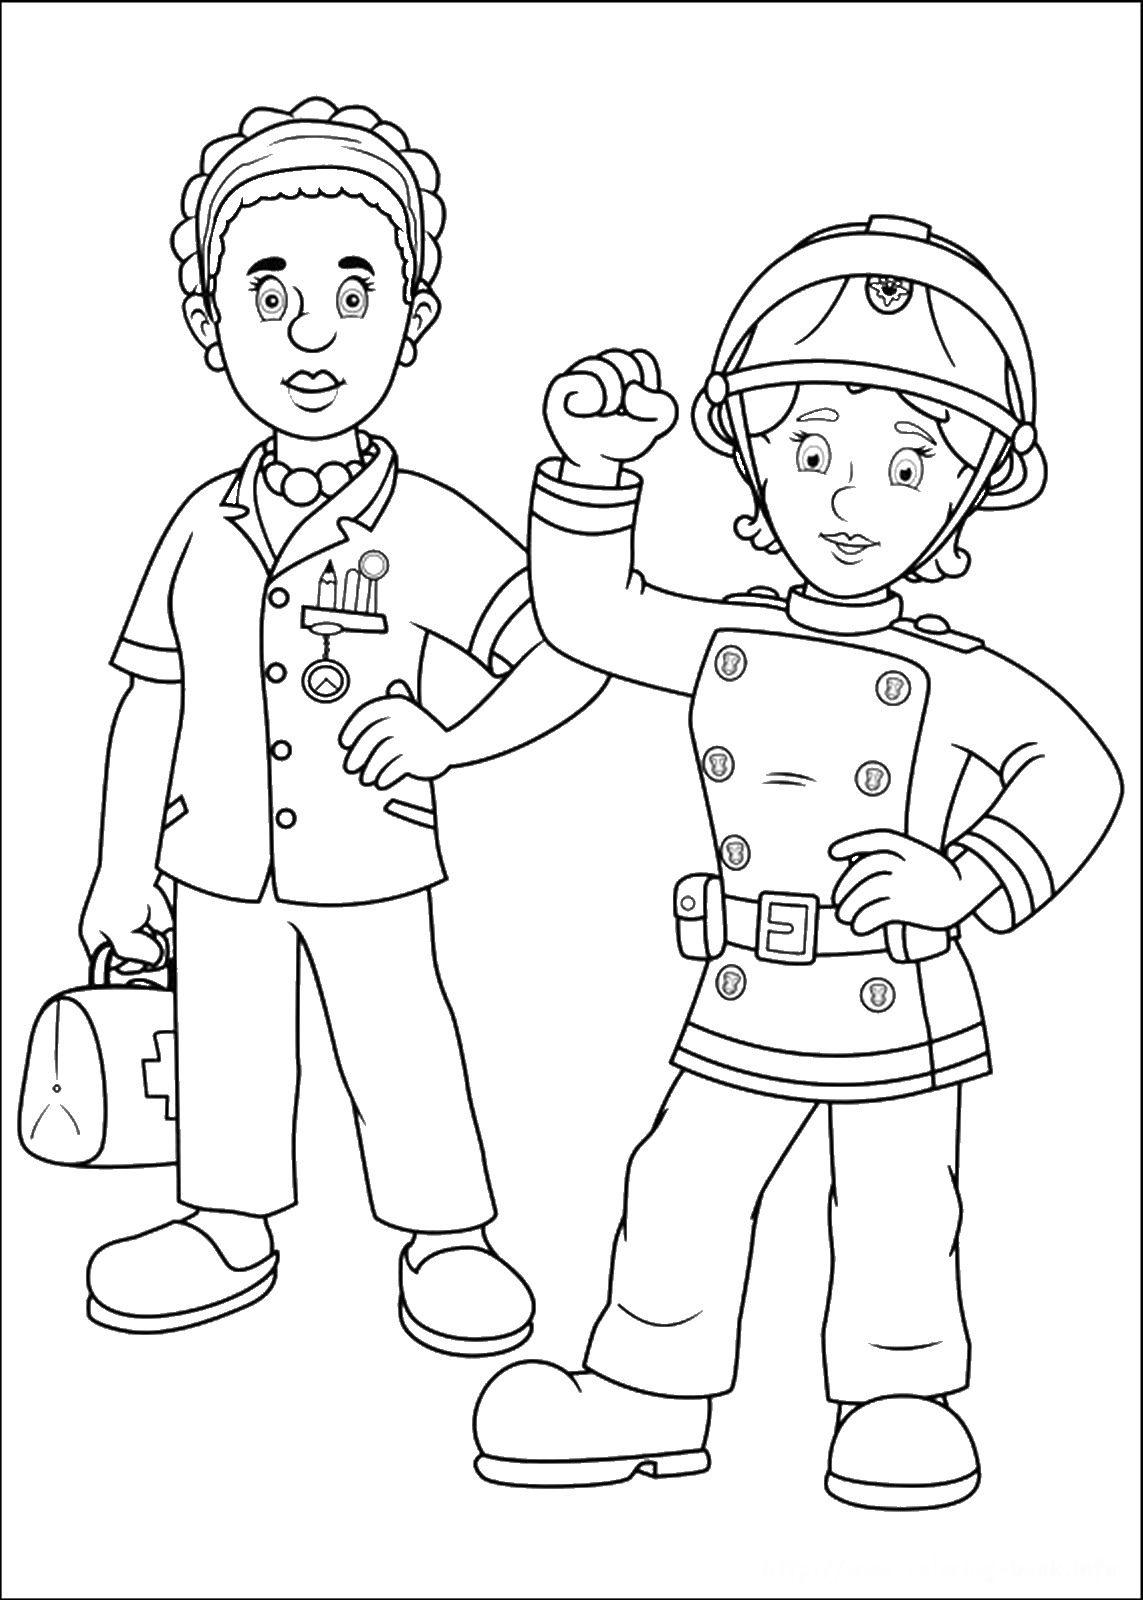 Sam Feuerwehrmann Ausmalbilder : Fireman_sam_cl_29 Jpg 1143 1600 Kolorowanki I Inne Stra Ak Sam